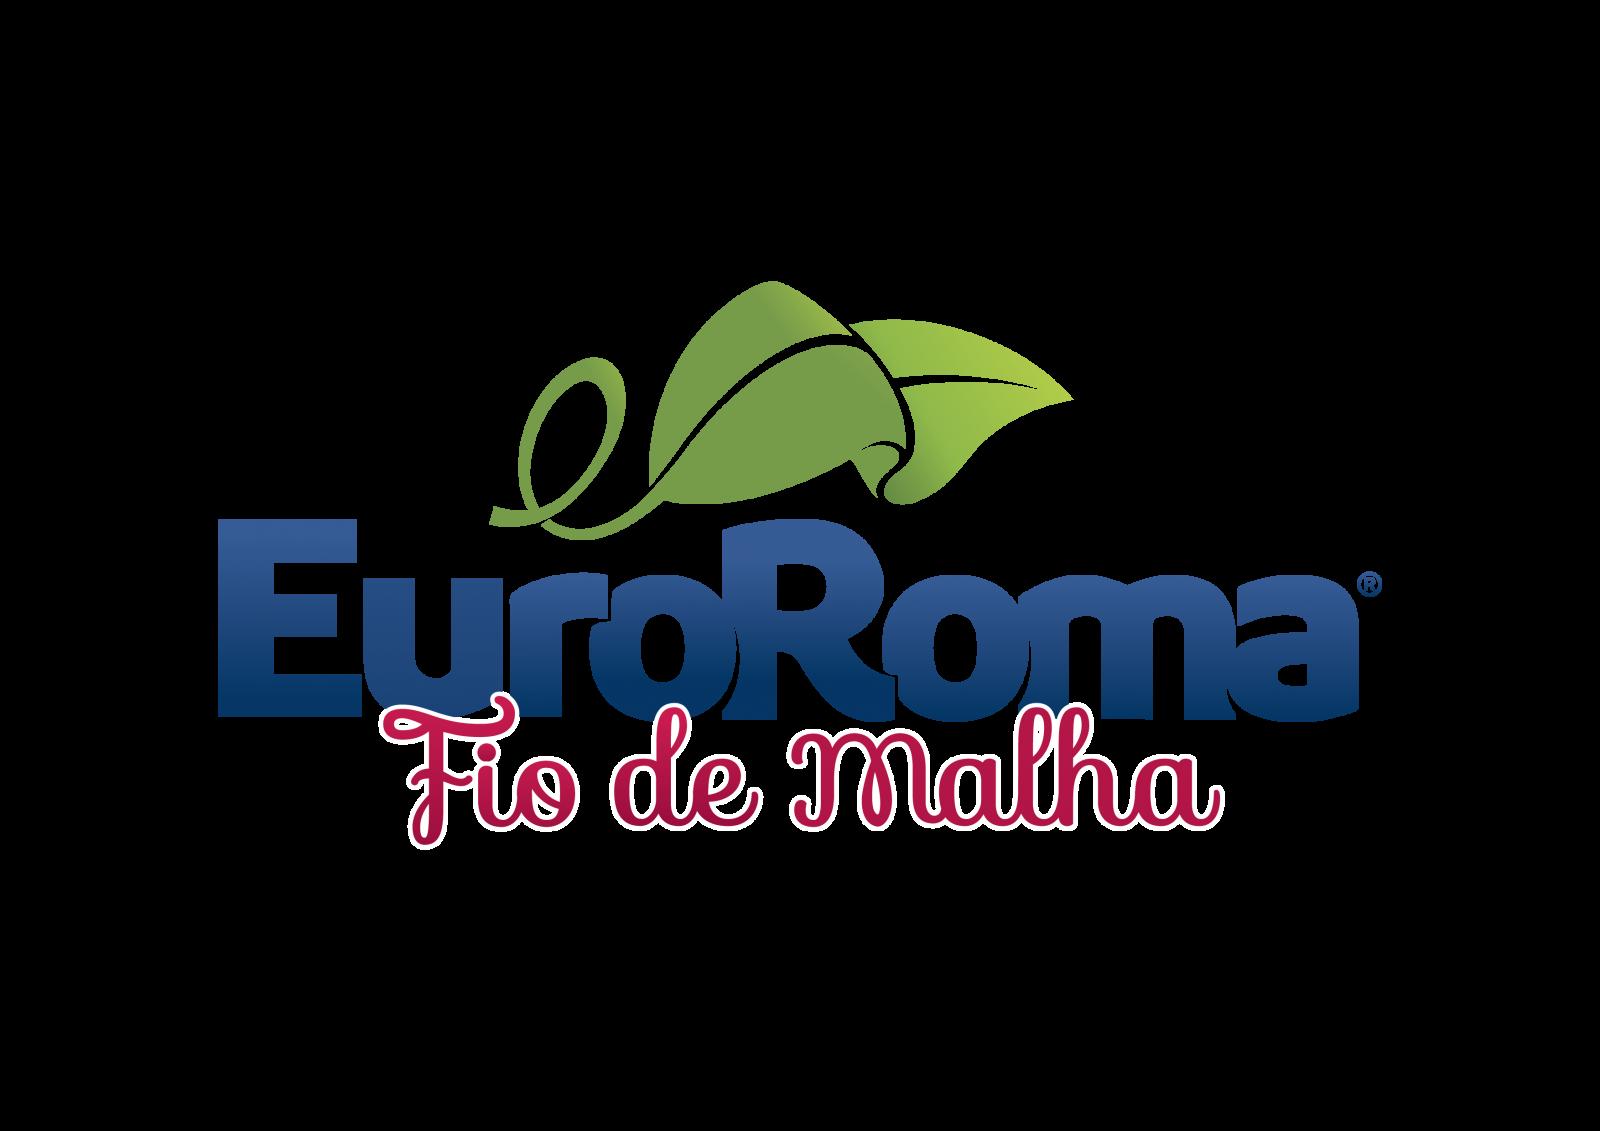 37ed273daa7f Dicas e Curiosidades: EuroRoma Fio de Malha - EuroRoma